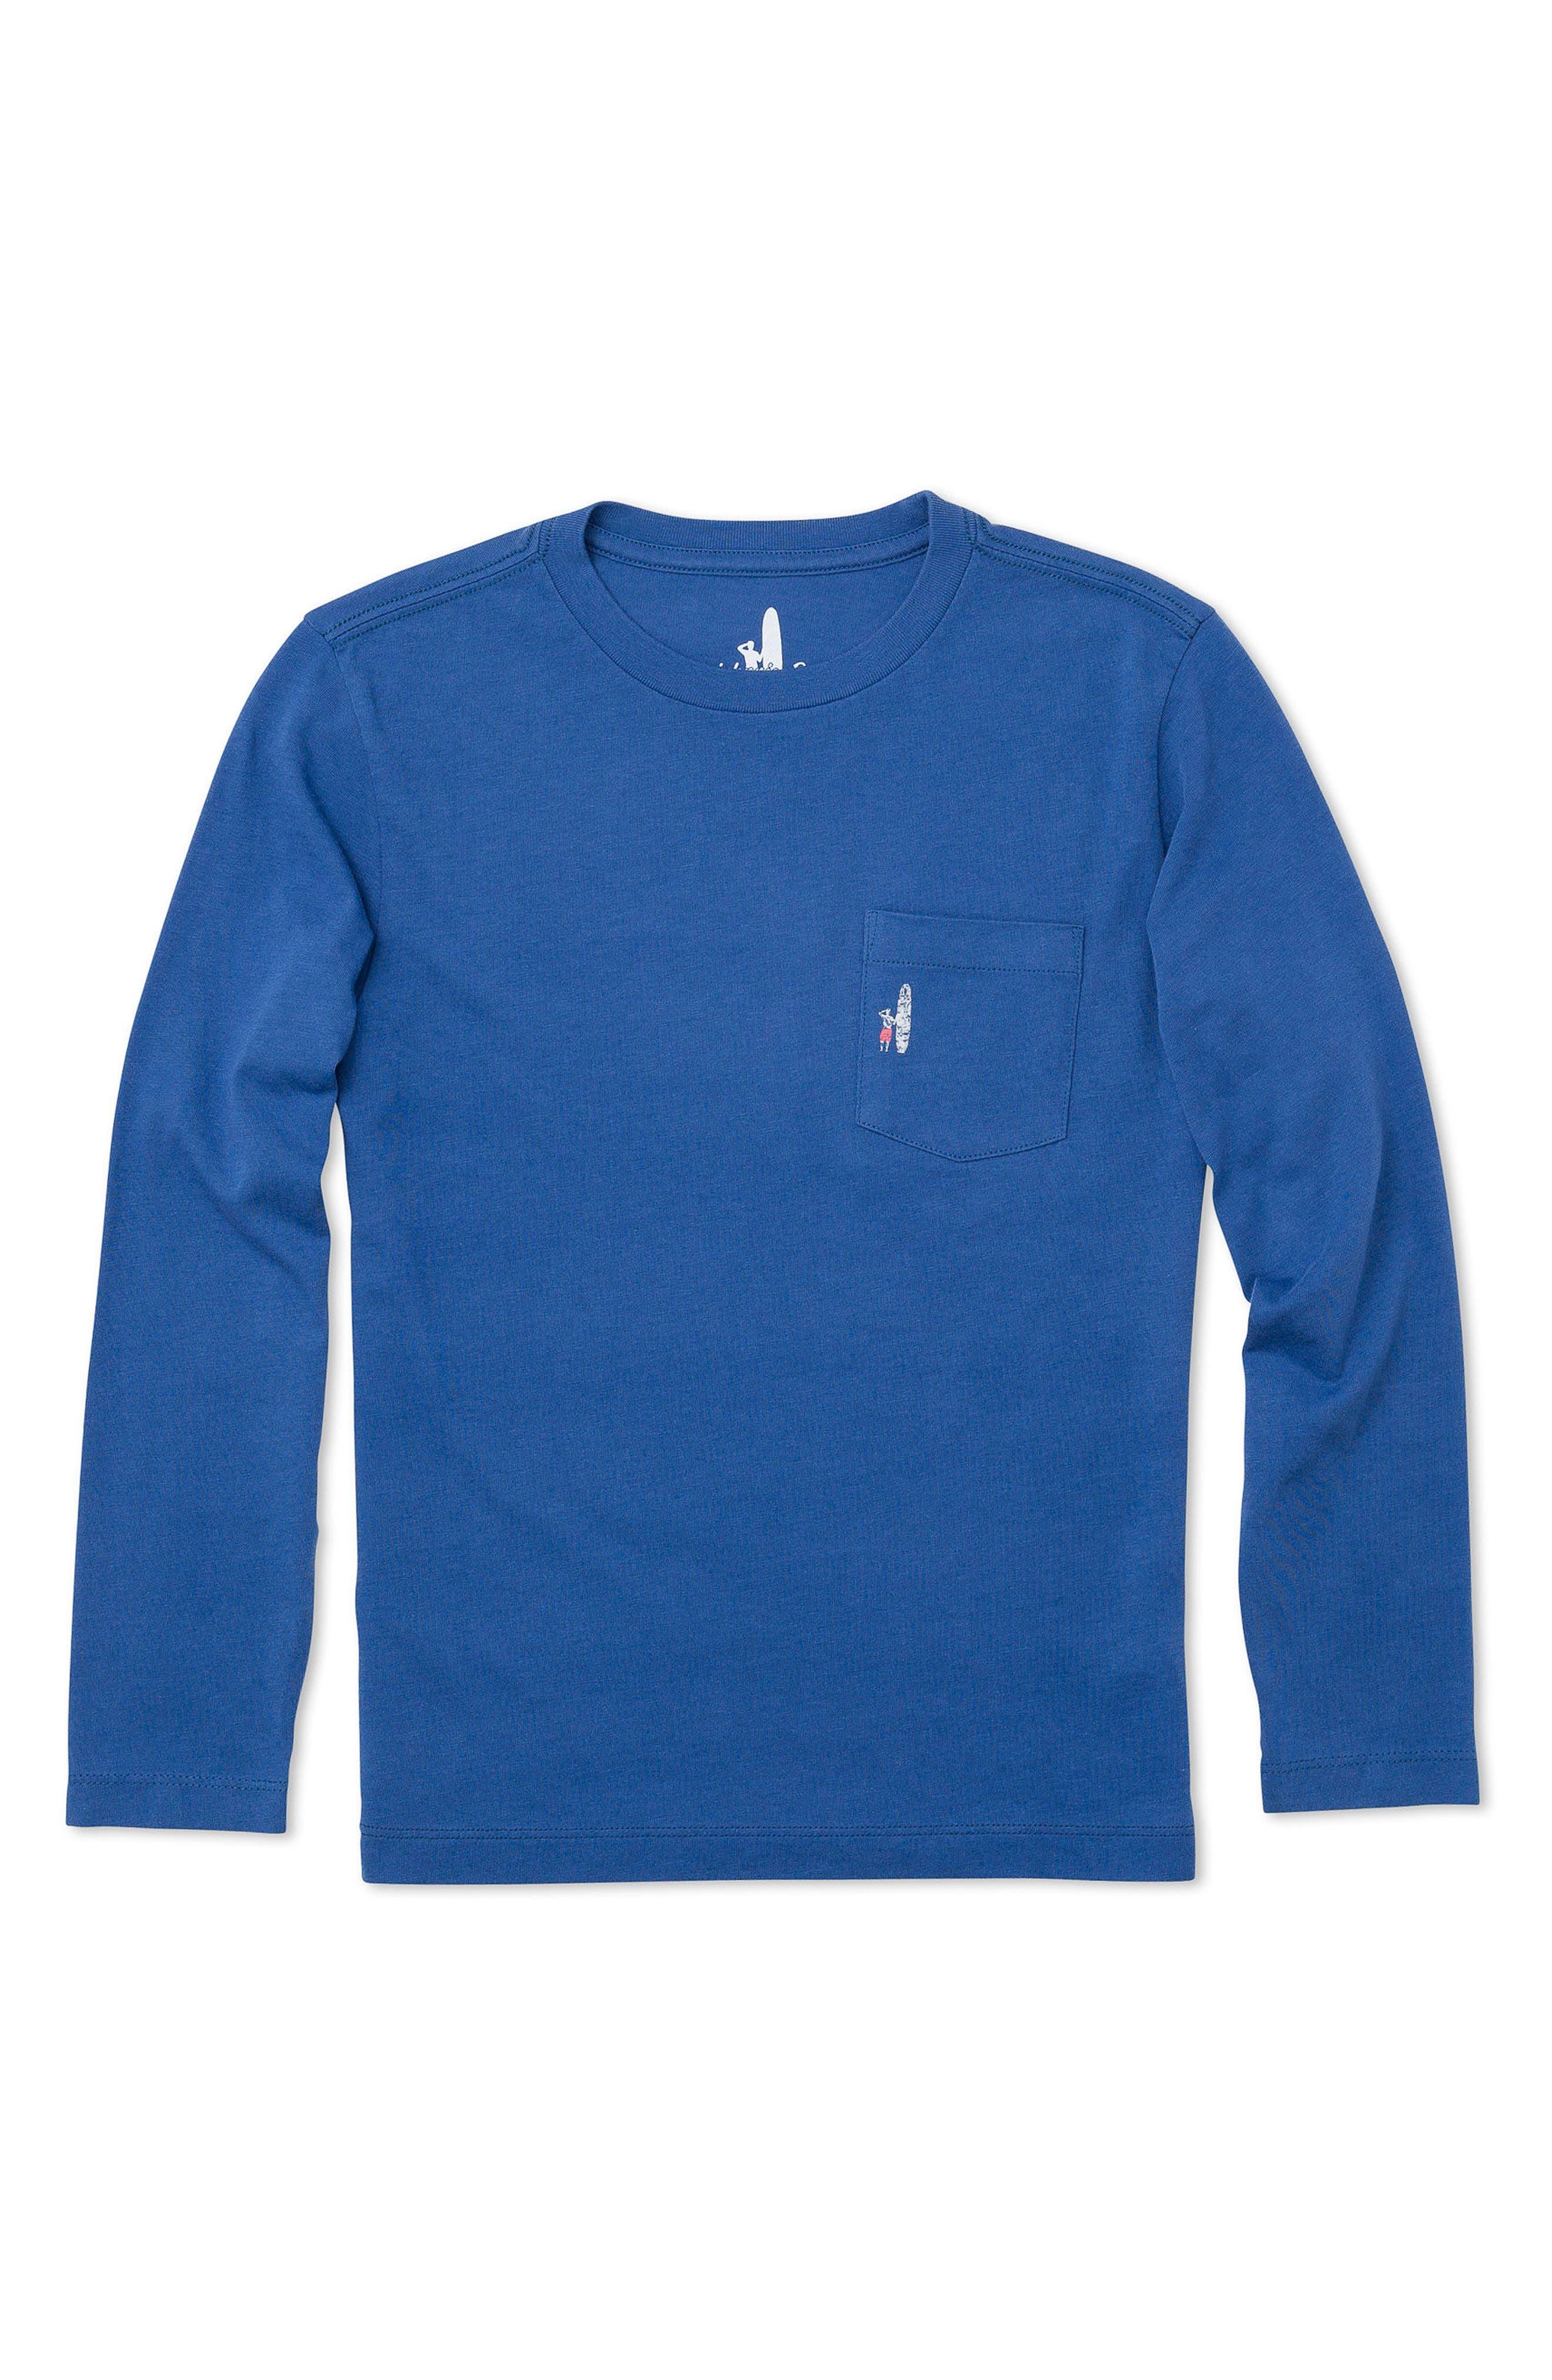 Reef Break Long-Sleeve Pocket T-Shirt,                             Alternate thumbnail 2, color,